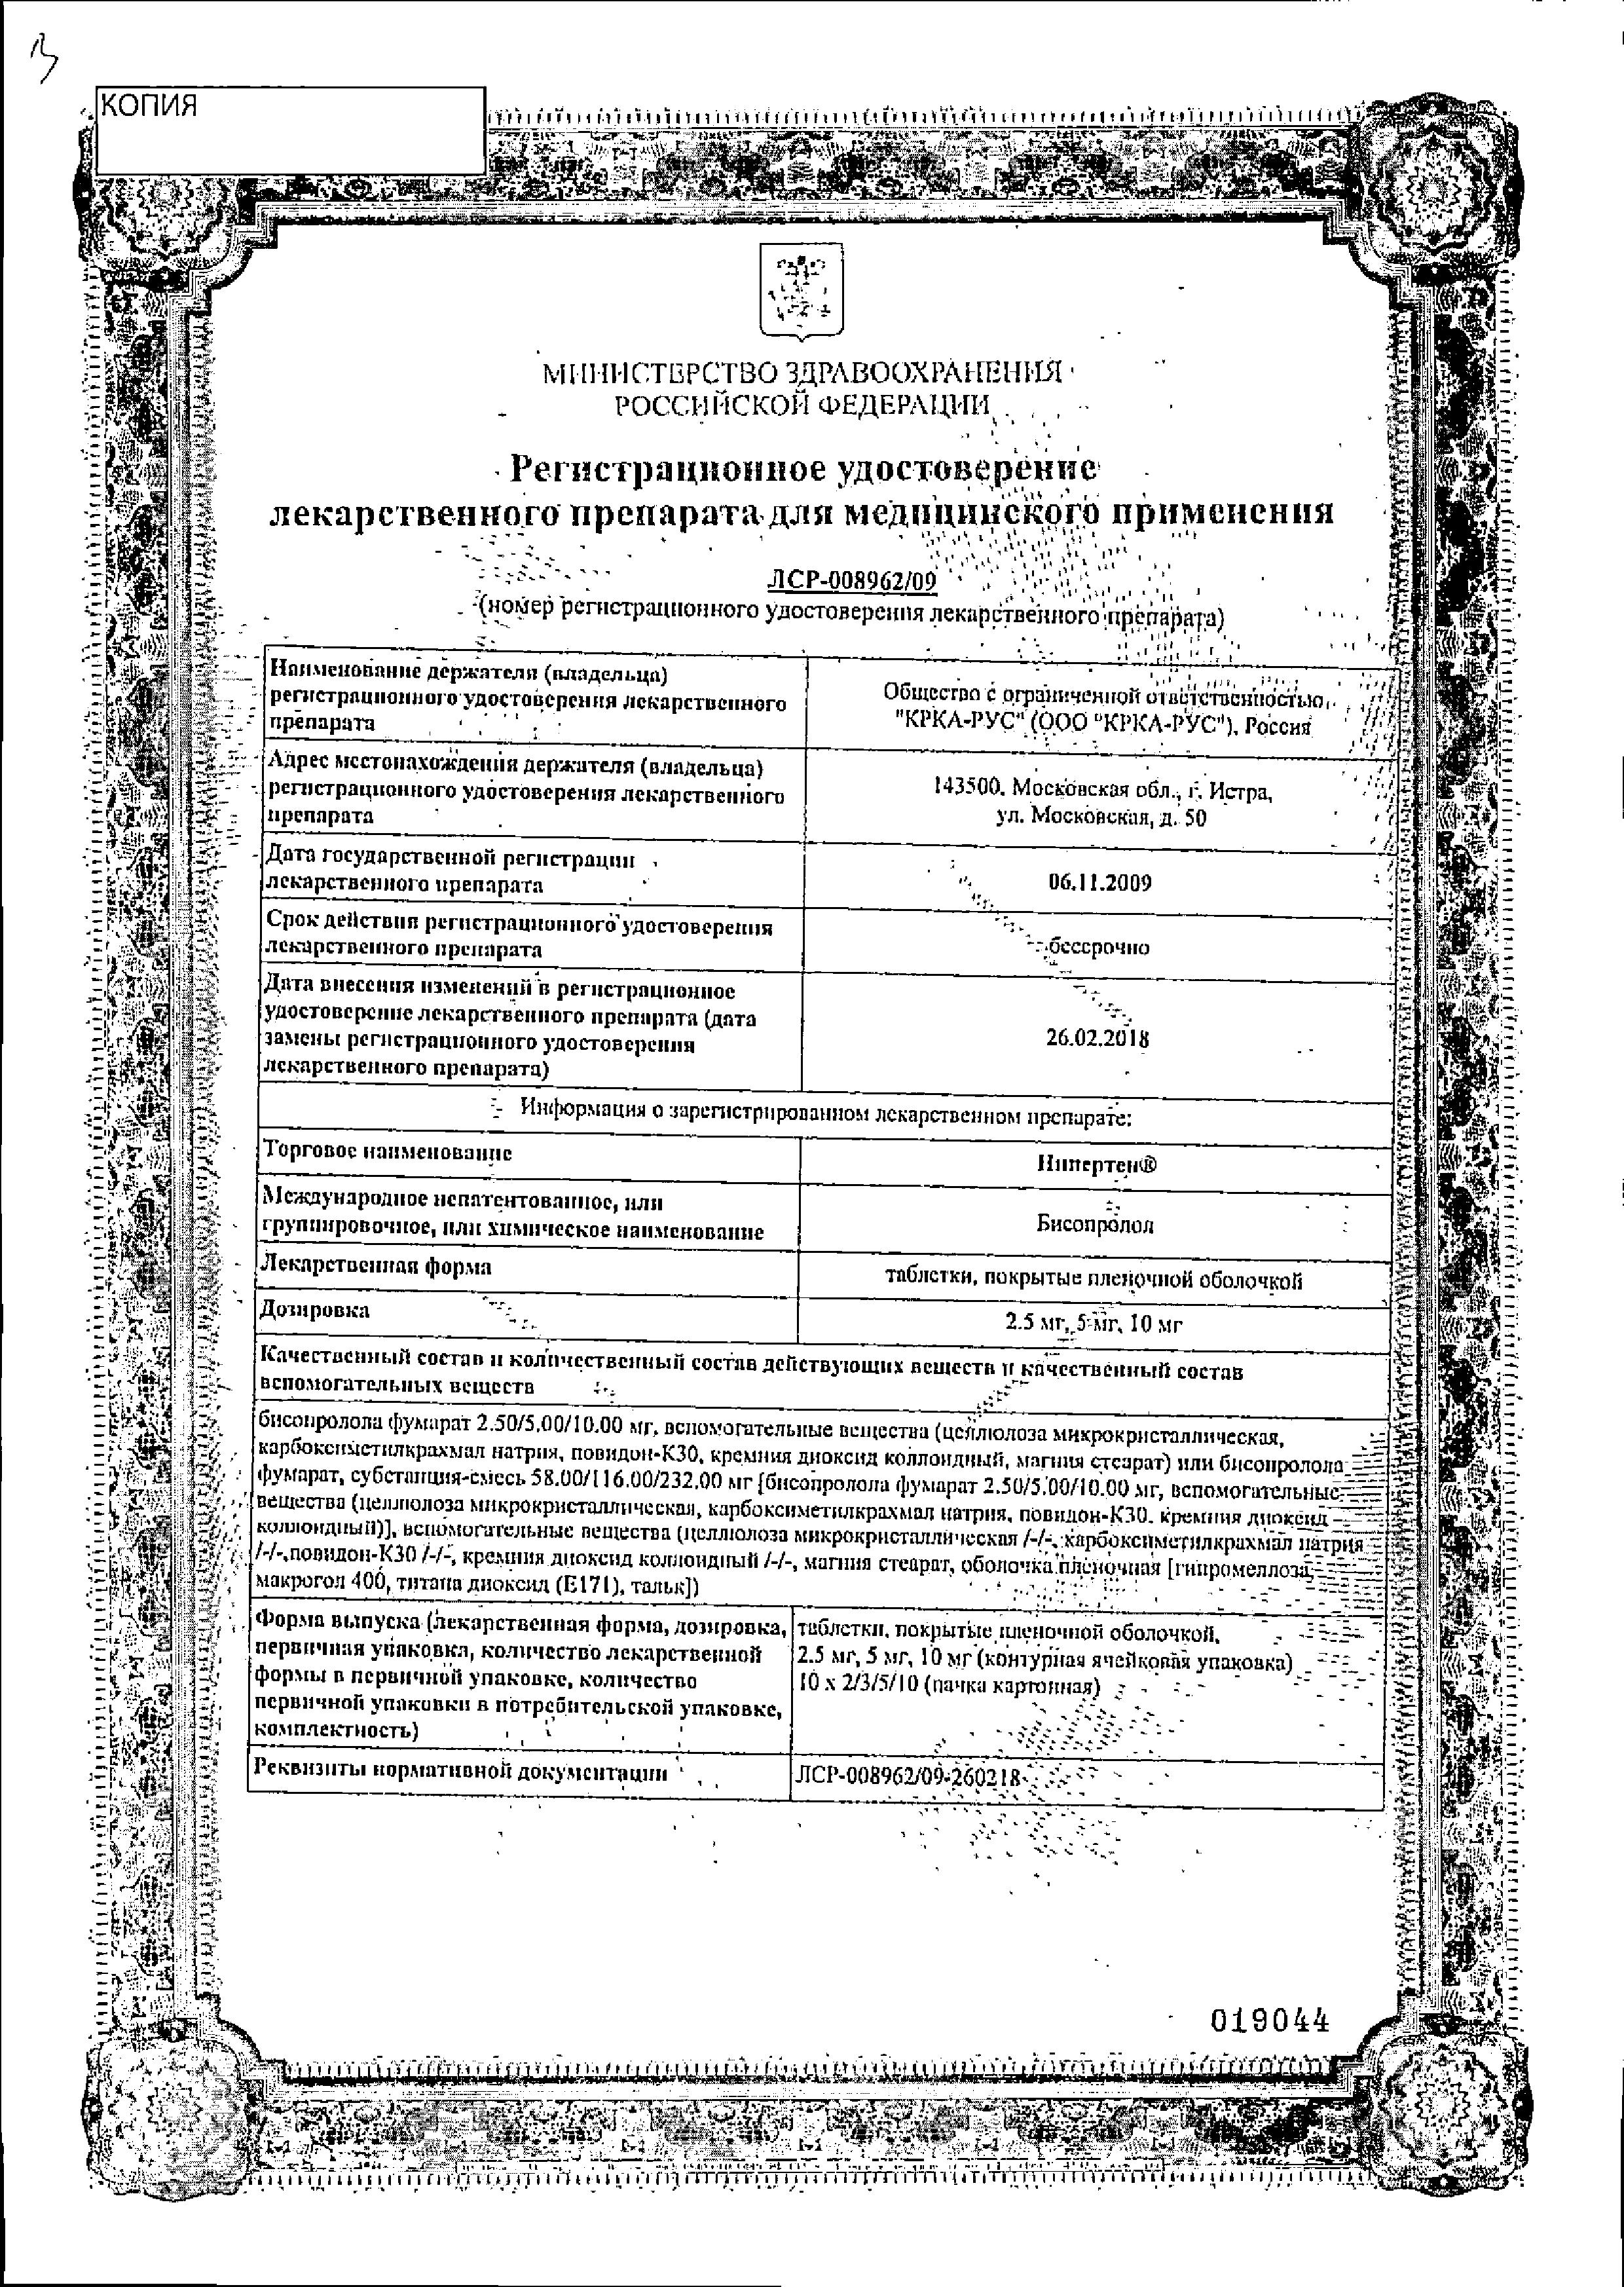 Нипертен сертификат